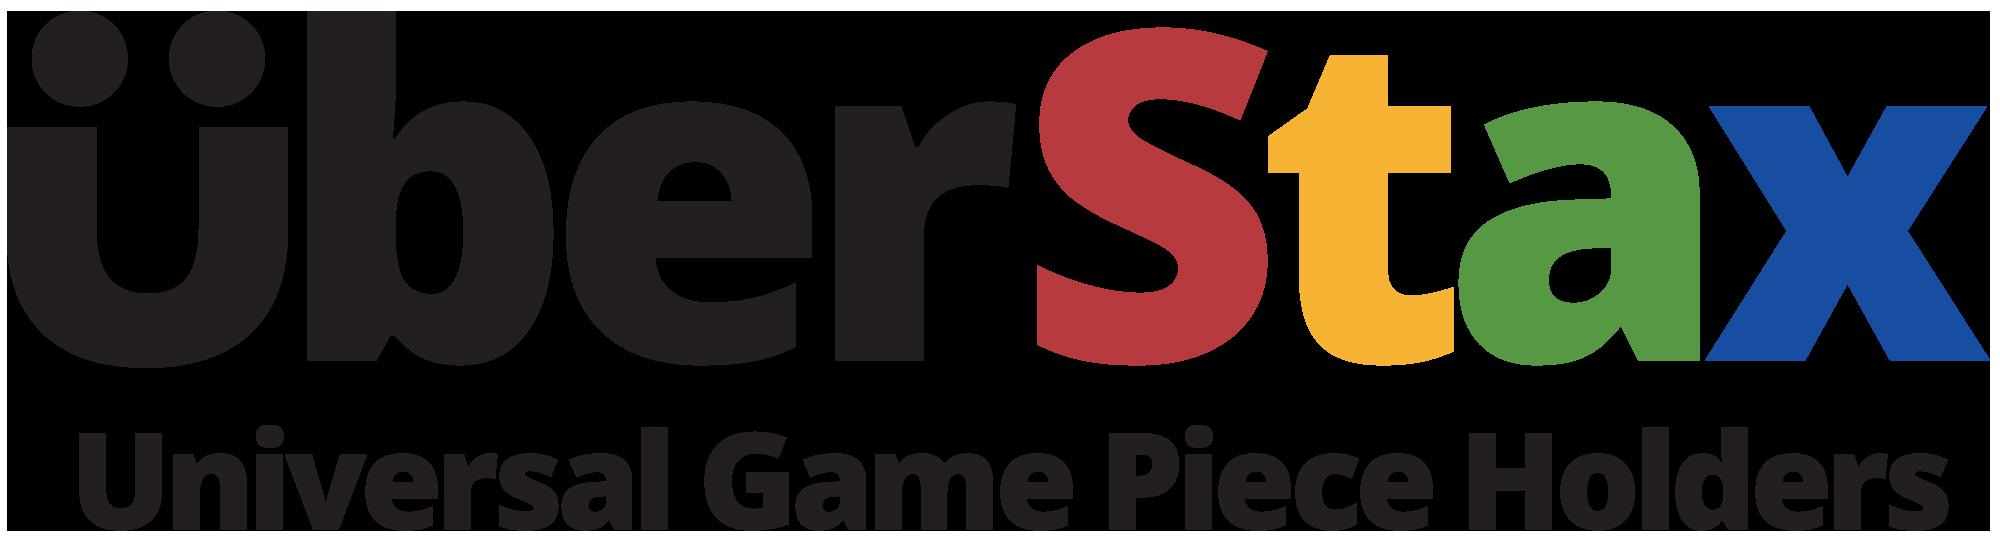 UberStax Logo